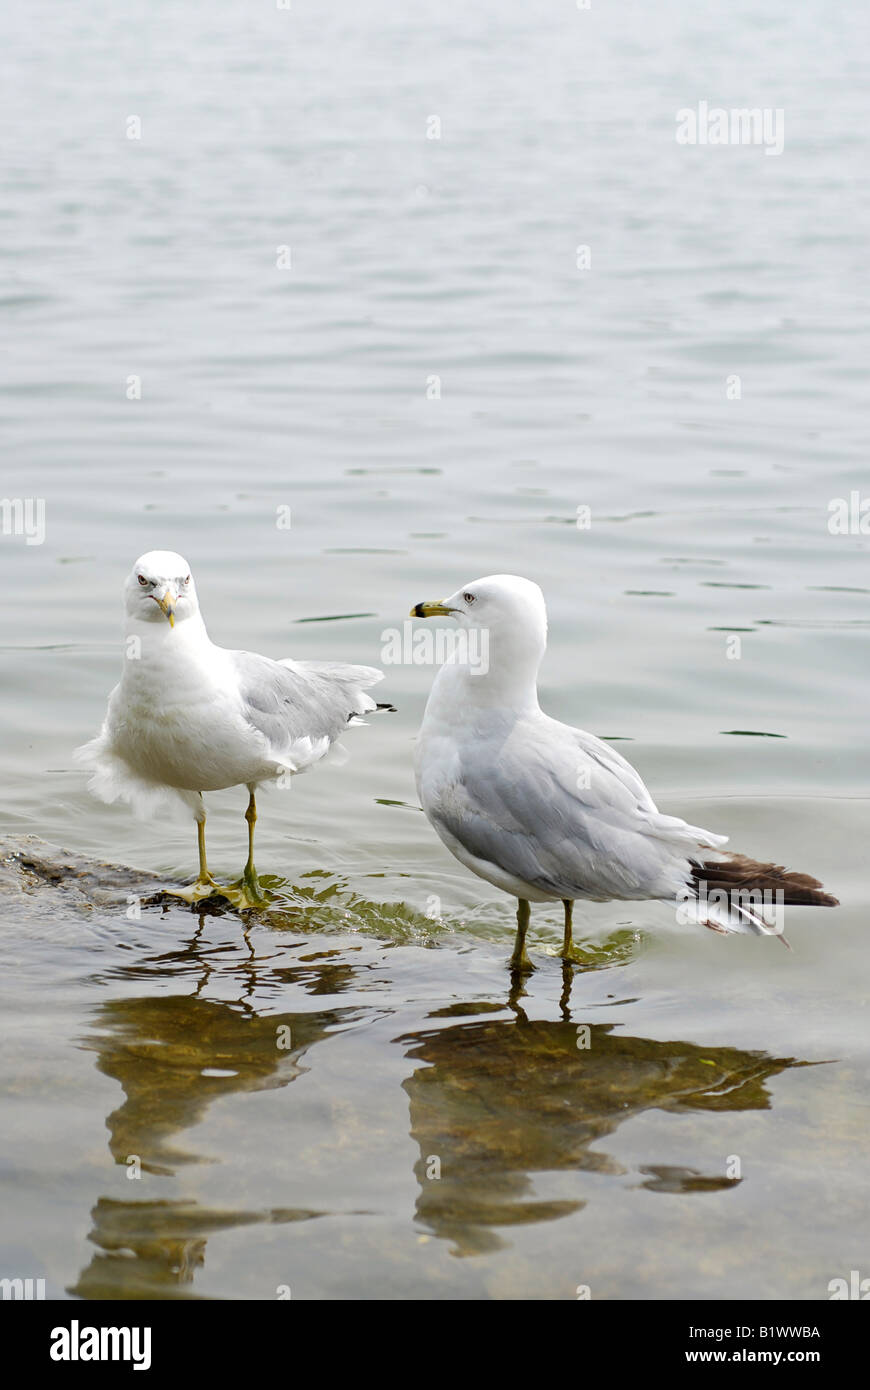 Pair of Herring Gulls / Seagulls, Mississauga, Port Credit area - Stock Image